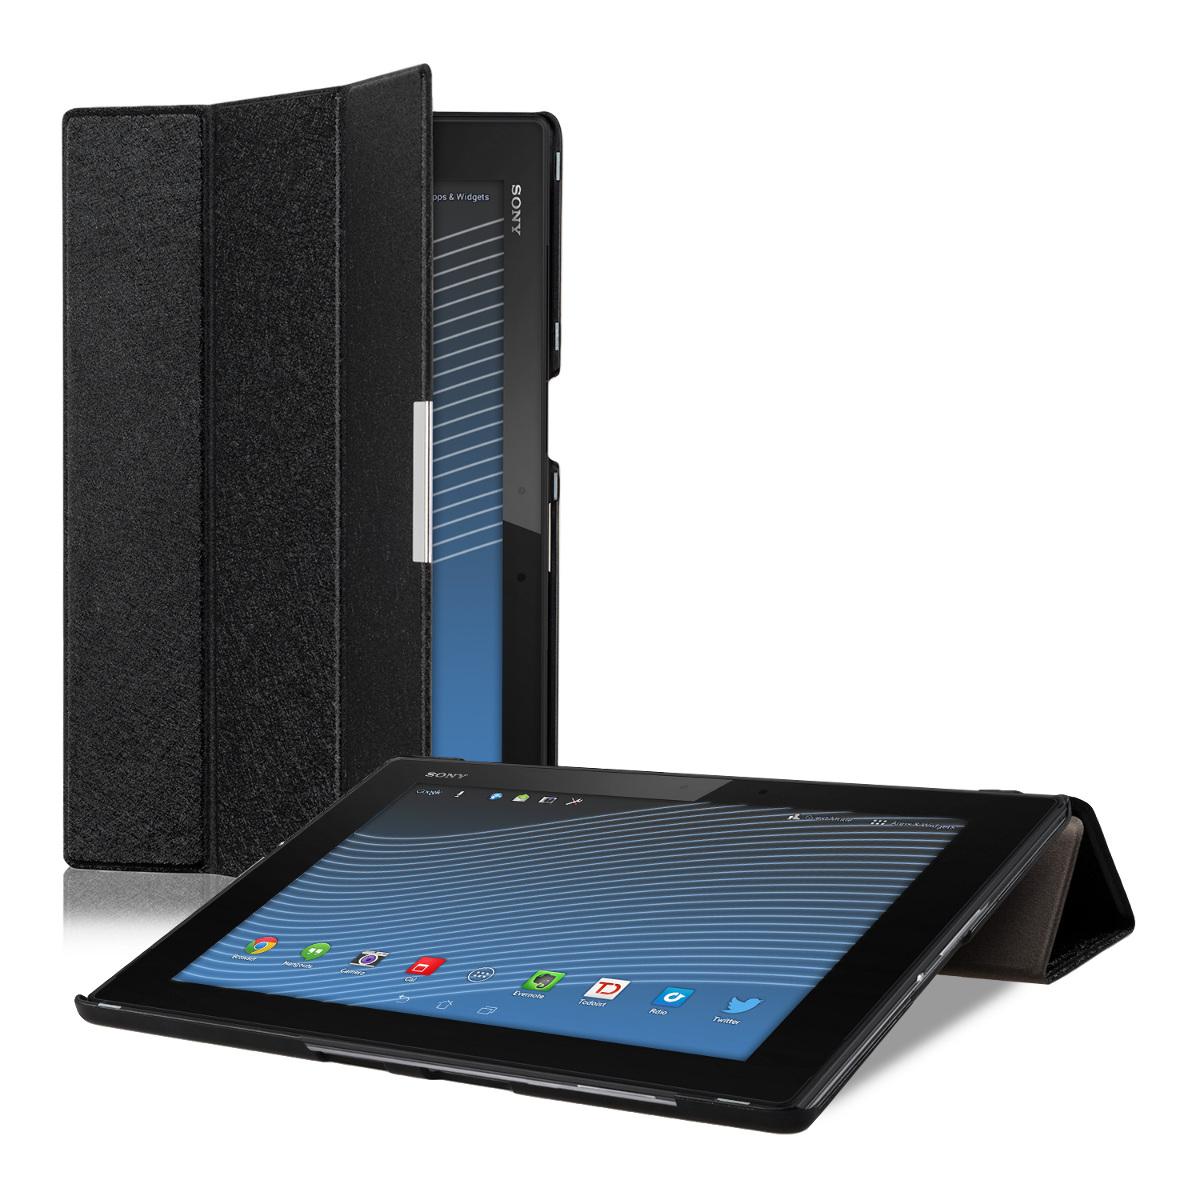 service, sony xperia z2 tablet hard case headphone port